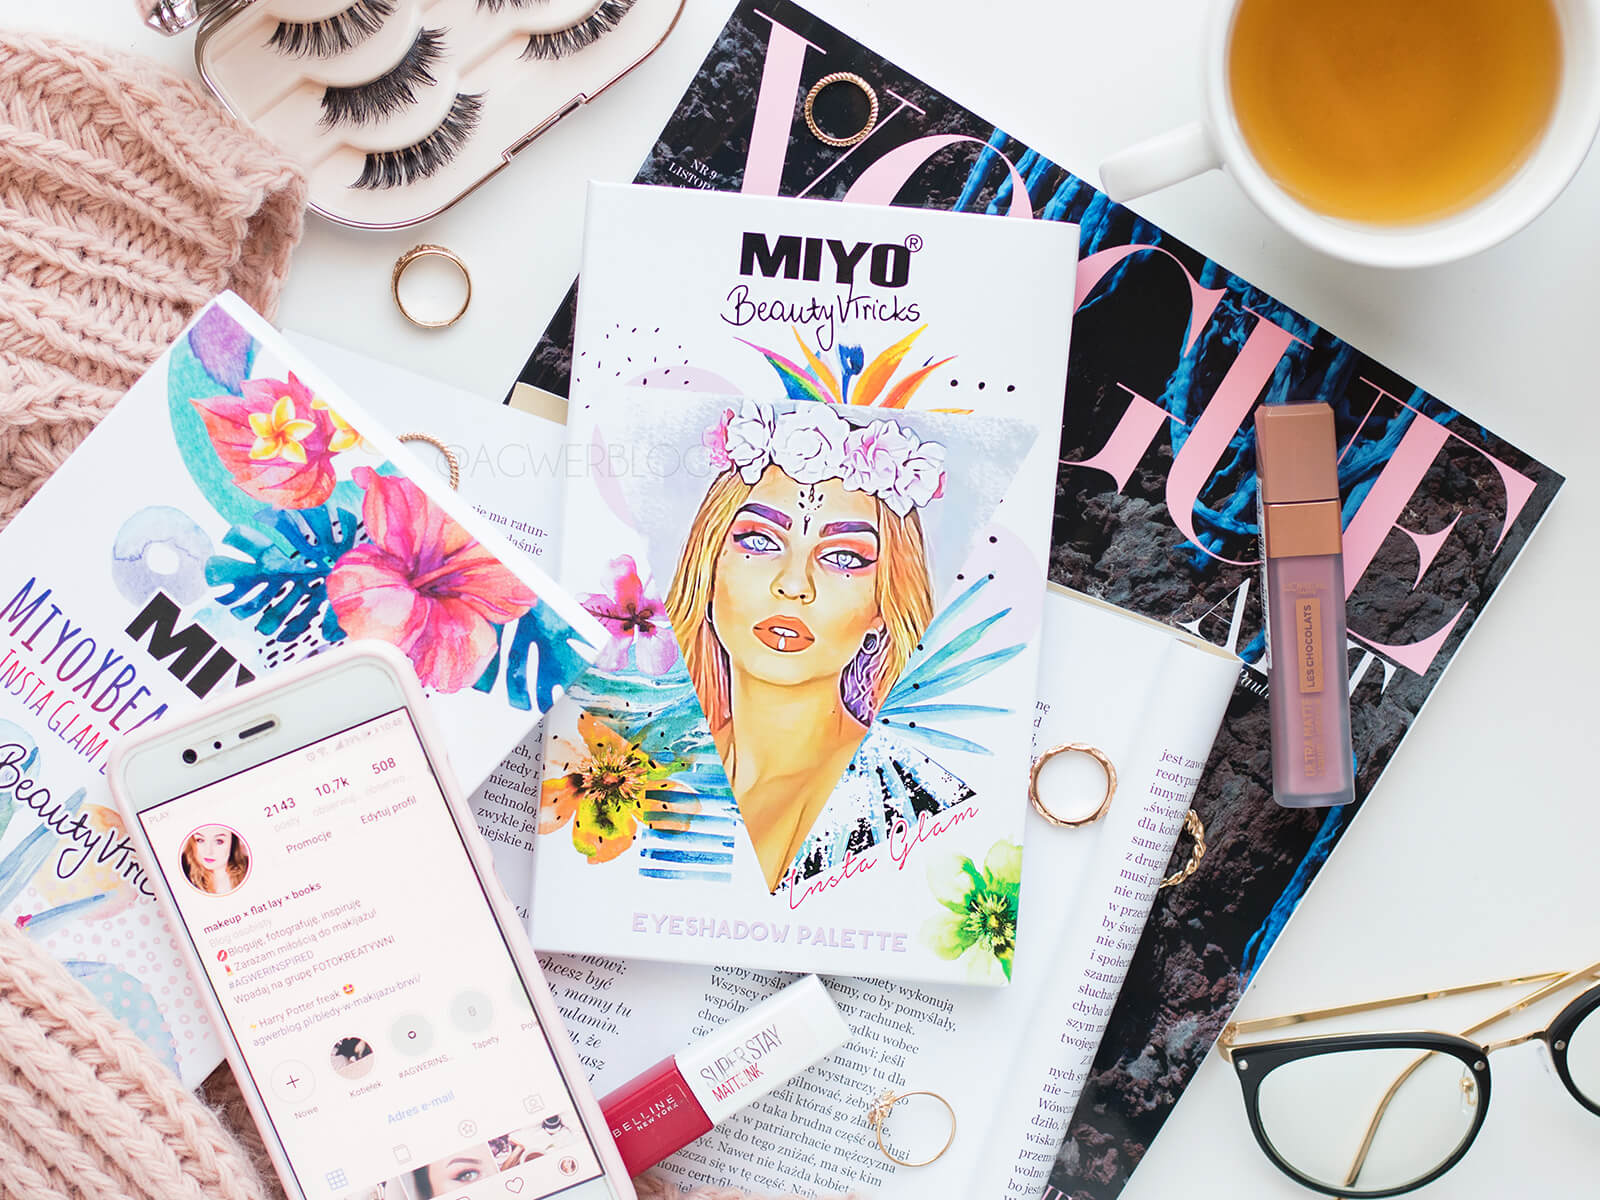 MIYO x Beautyvtricks Insta Glam: tydzień #PALETLOVE